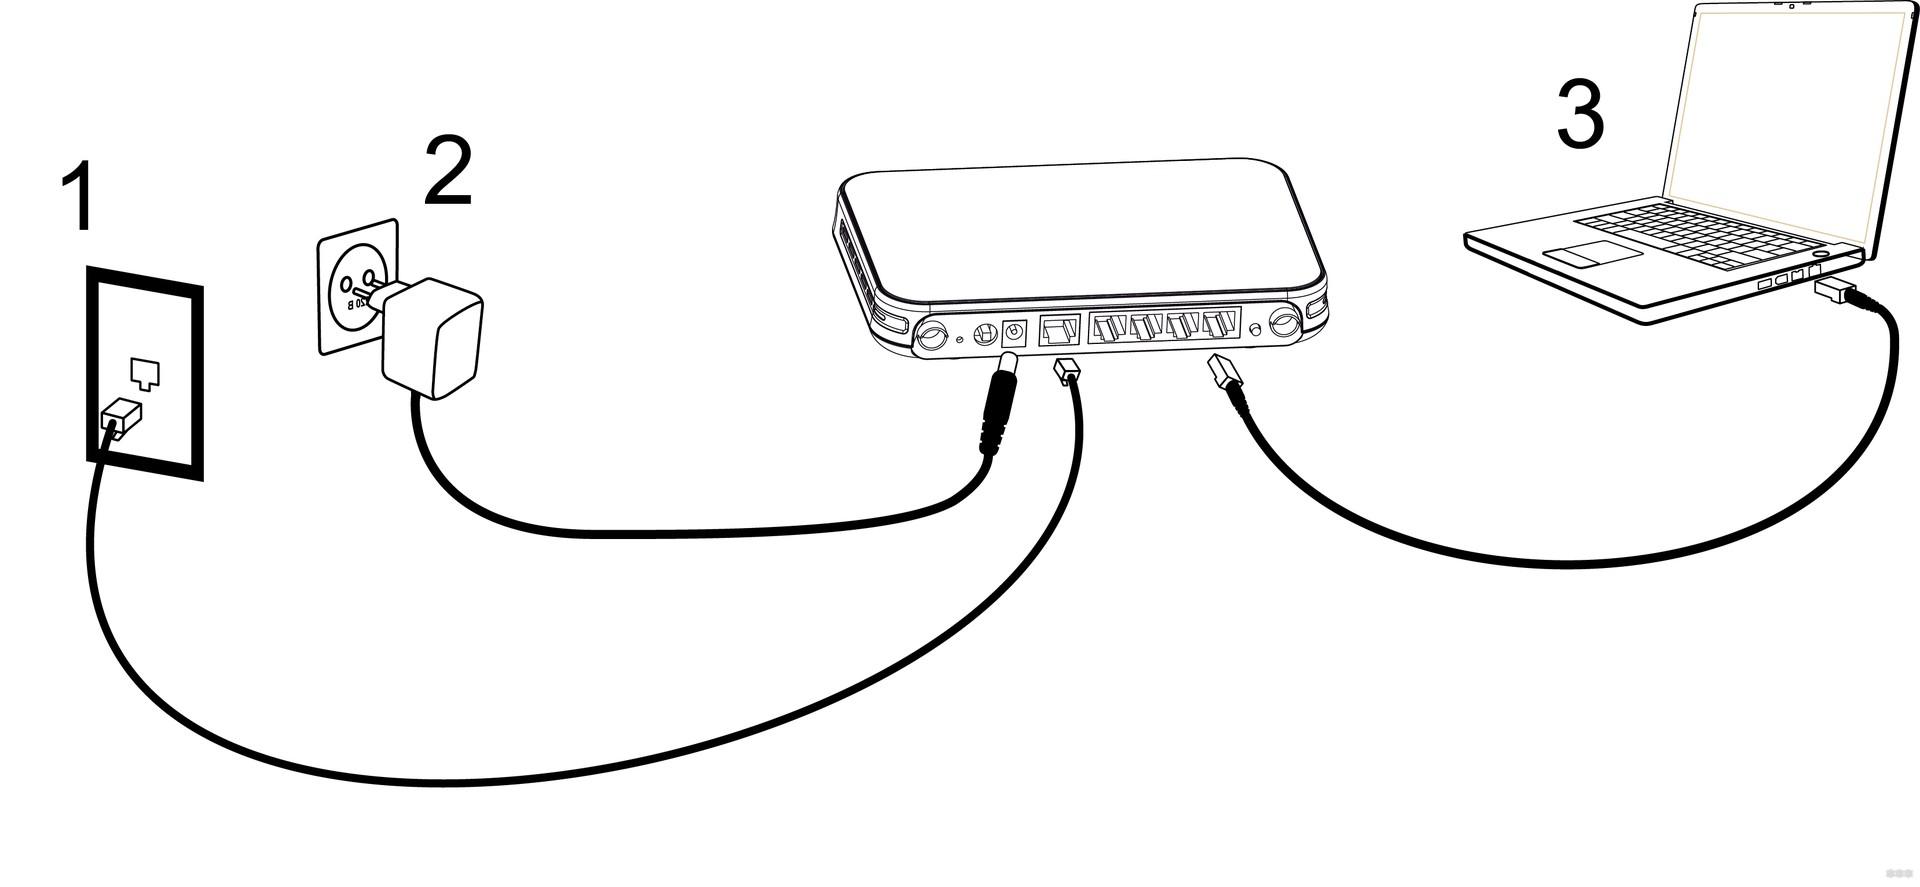 Маршрутизатор без Wi-Fi: обзор моделей и пример настройки